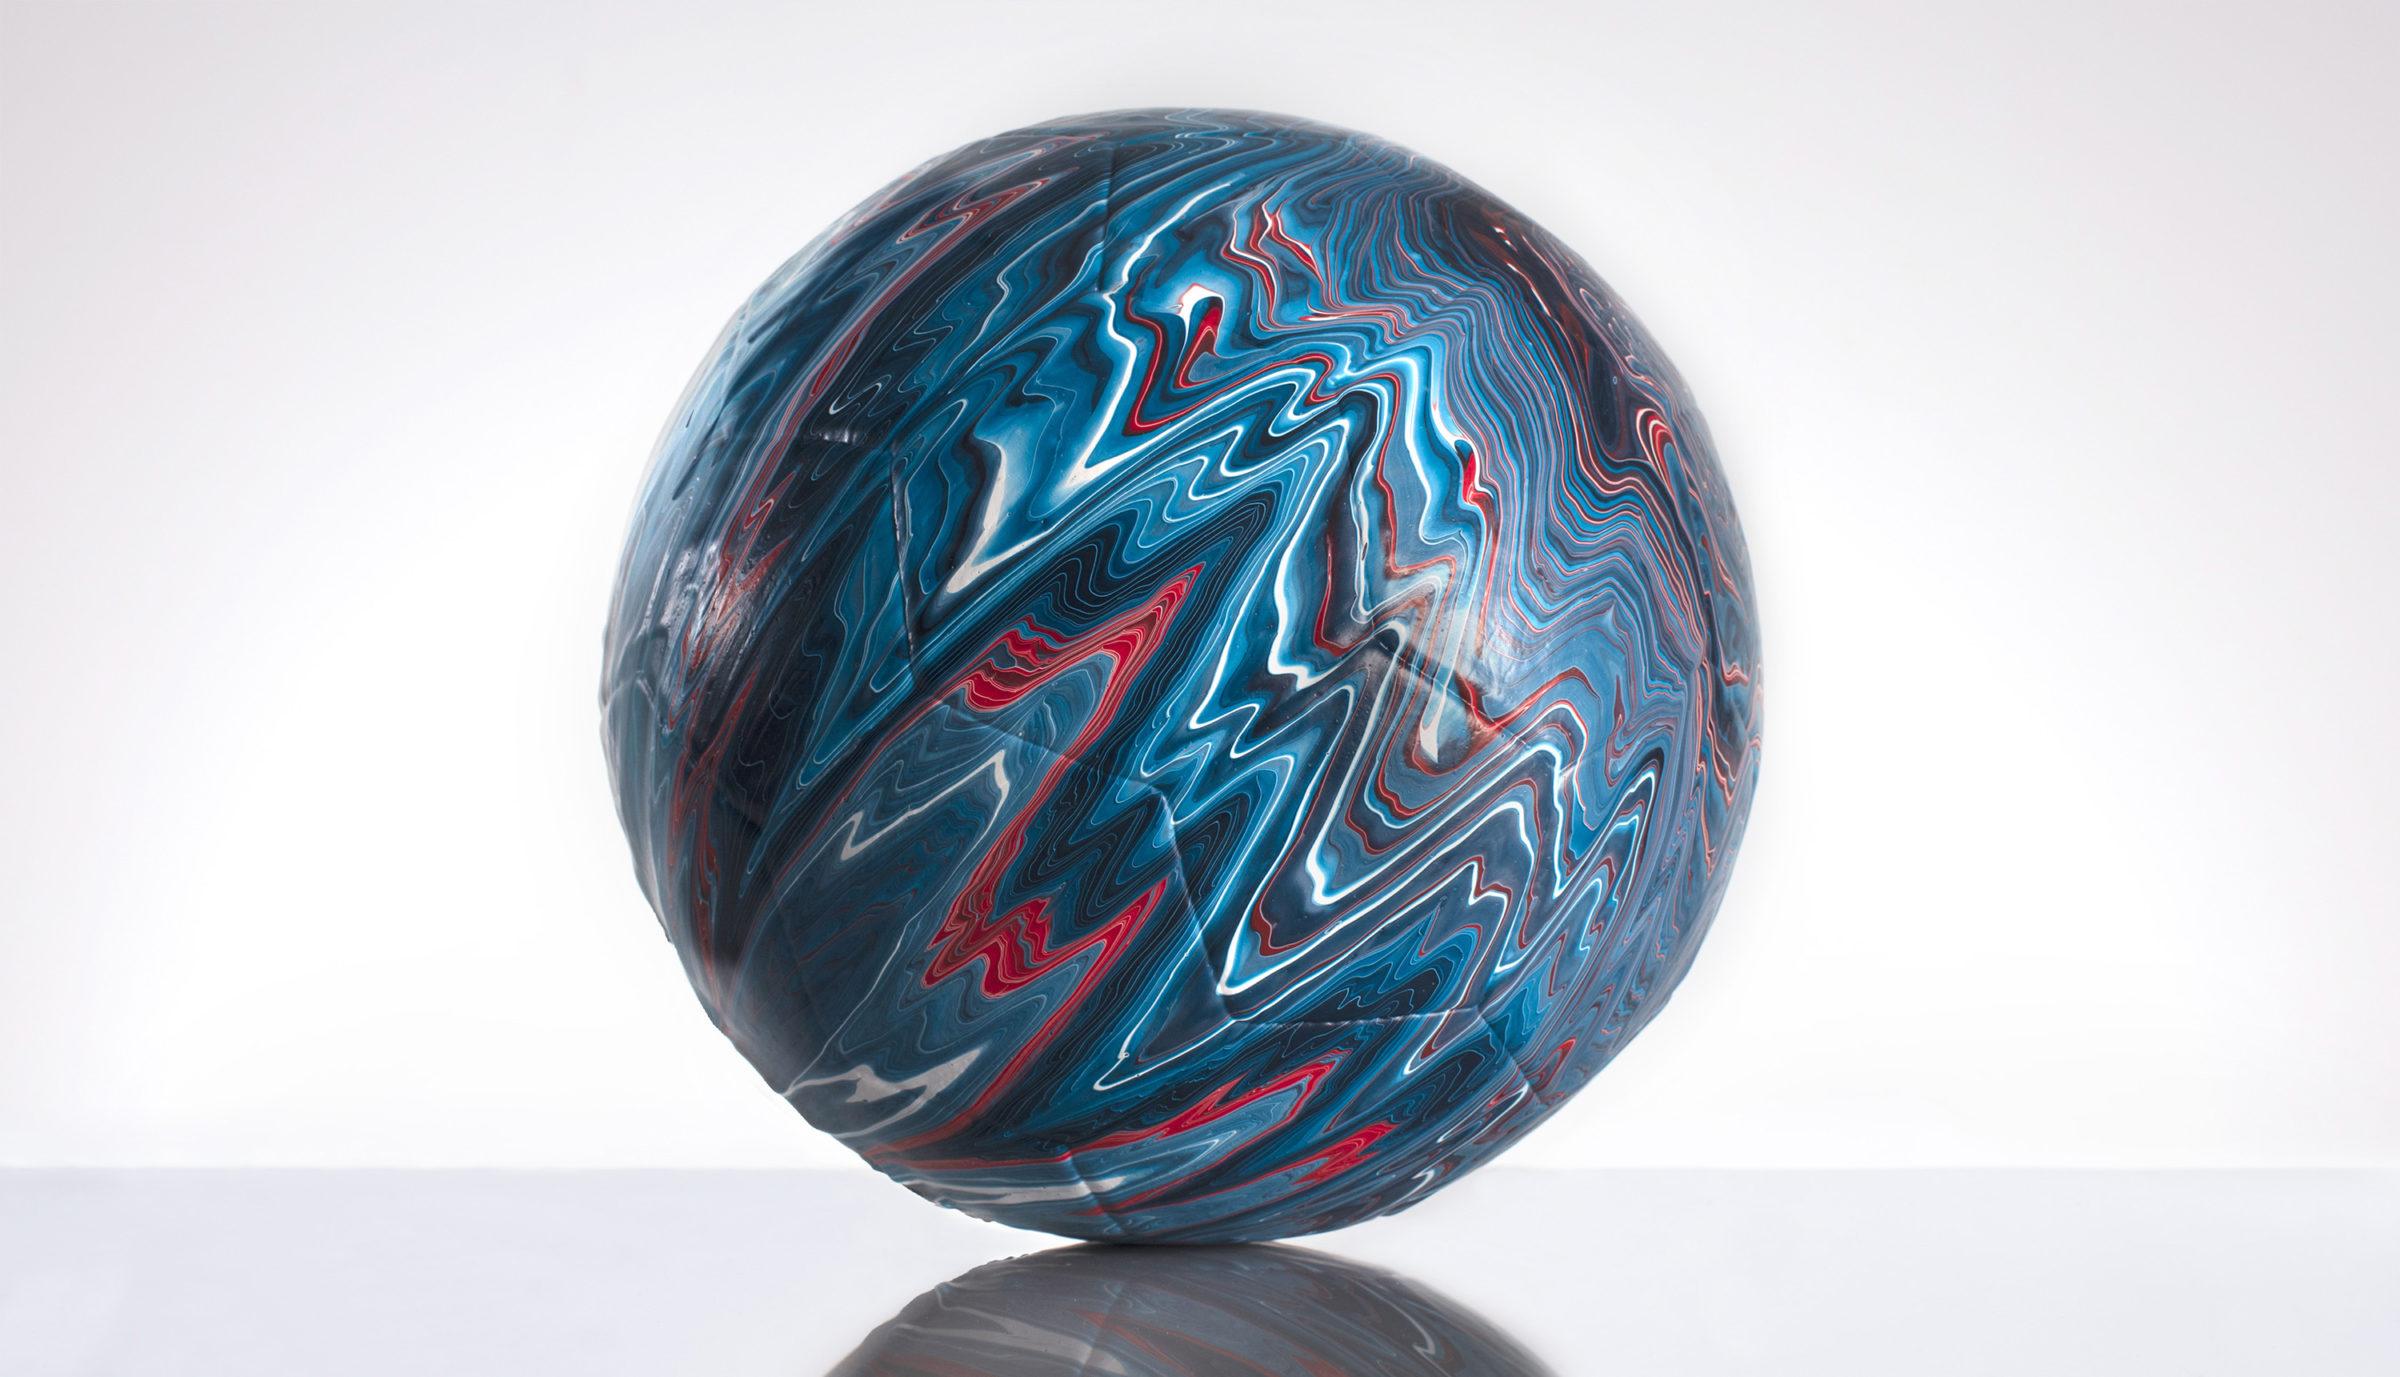 Craig Black x The Fusion Series Footballs Acrylic Fusion Football Art Installation 06 Scotland